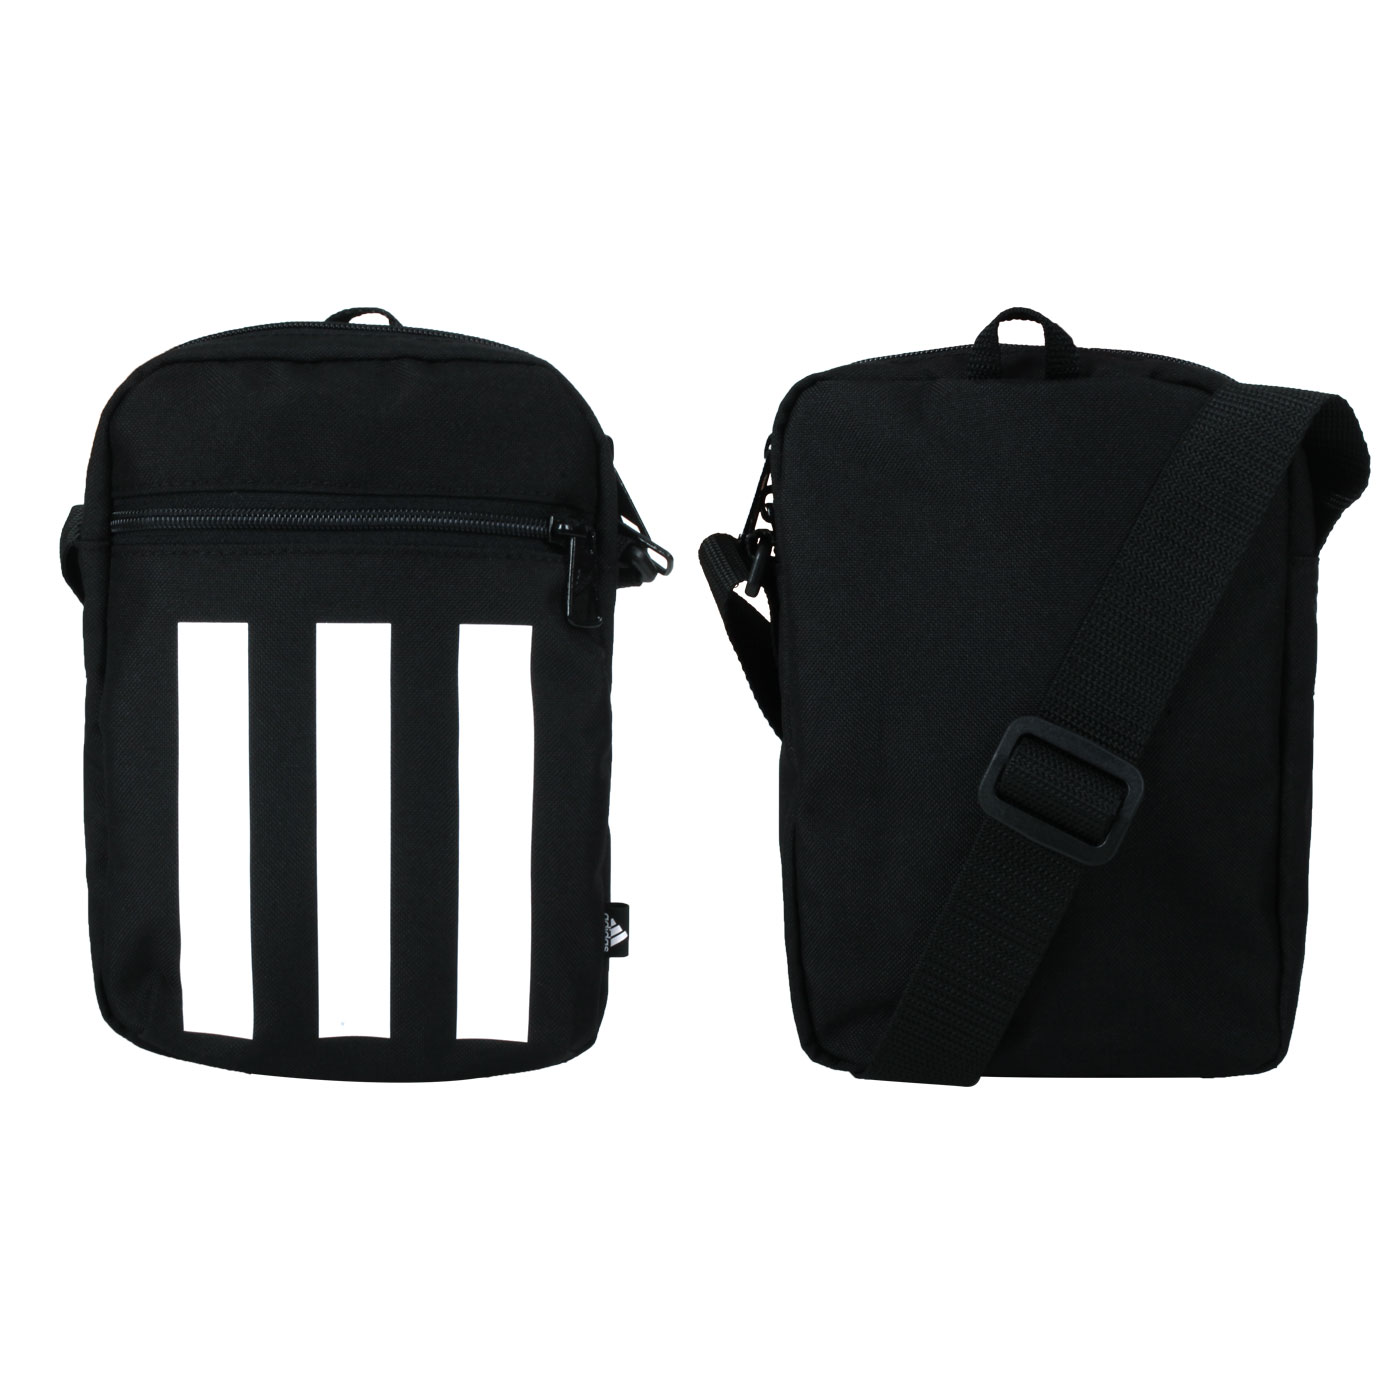 ADIDAS 小型裝備袋 GN1928 - 黑白